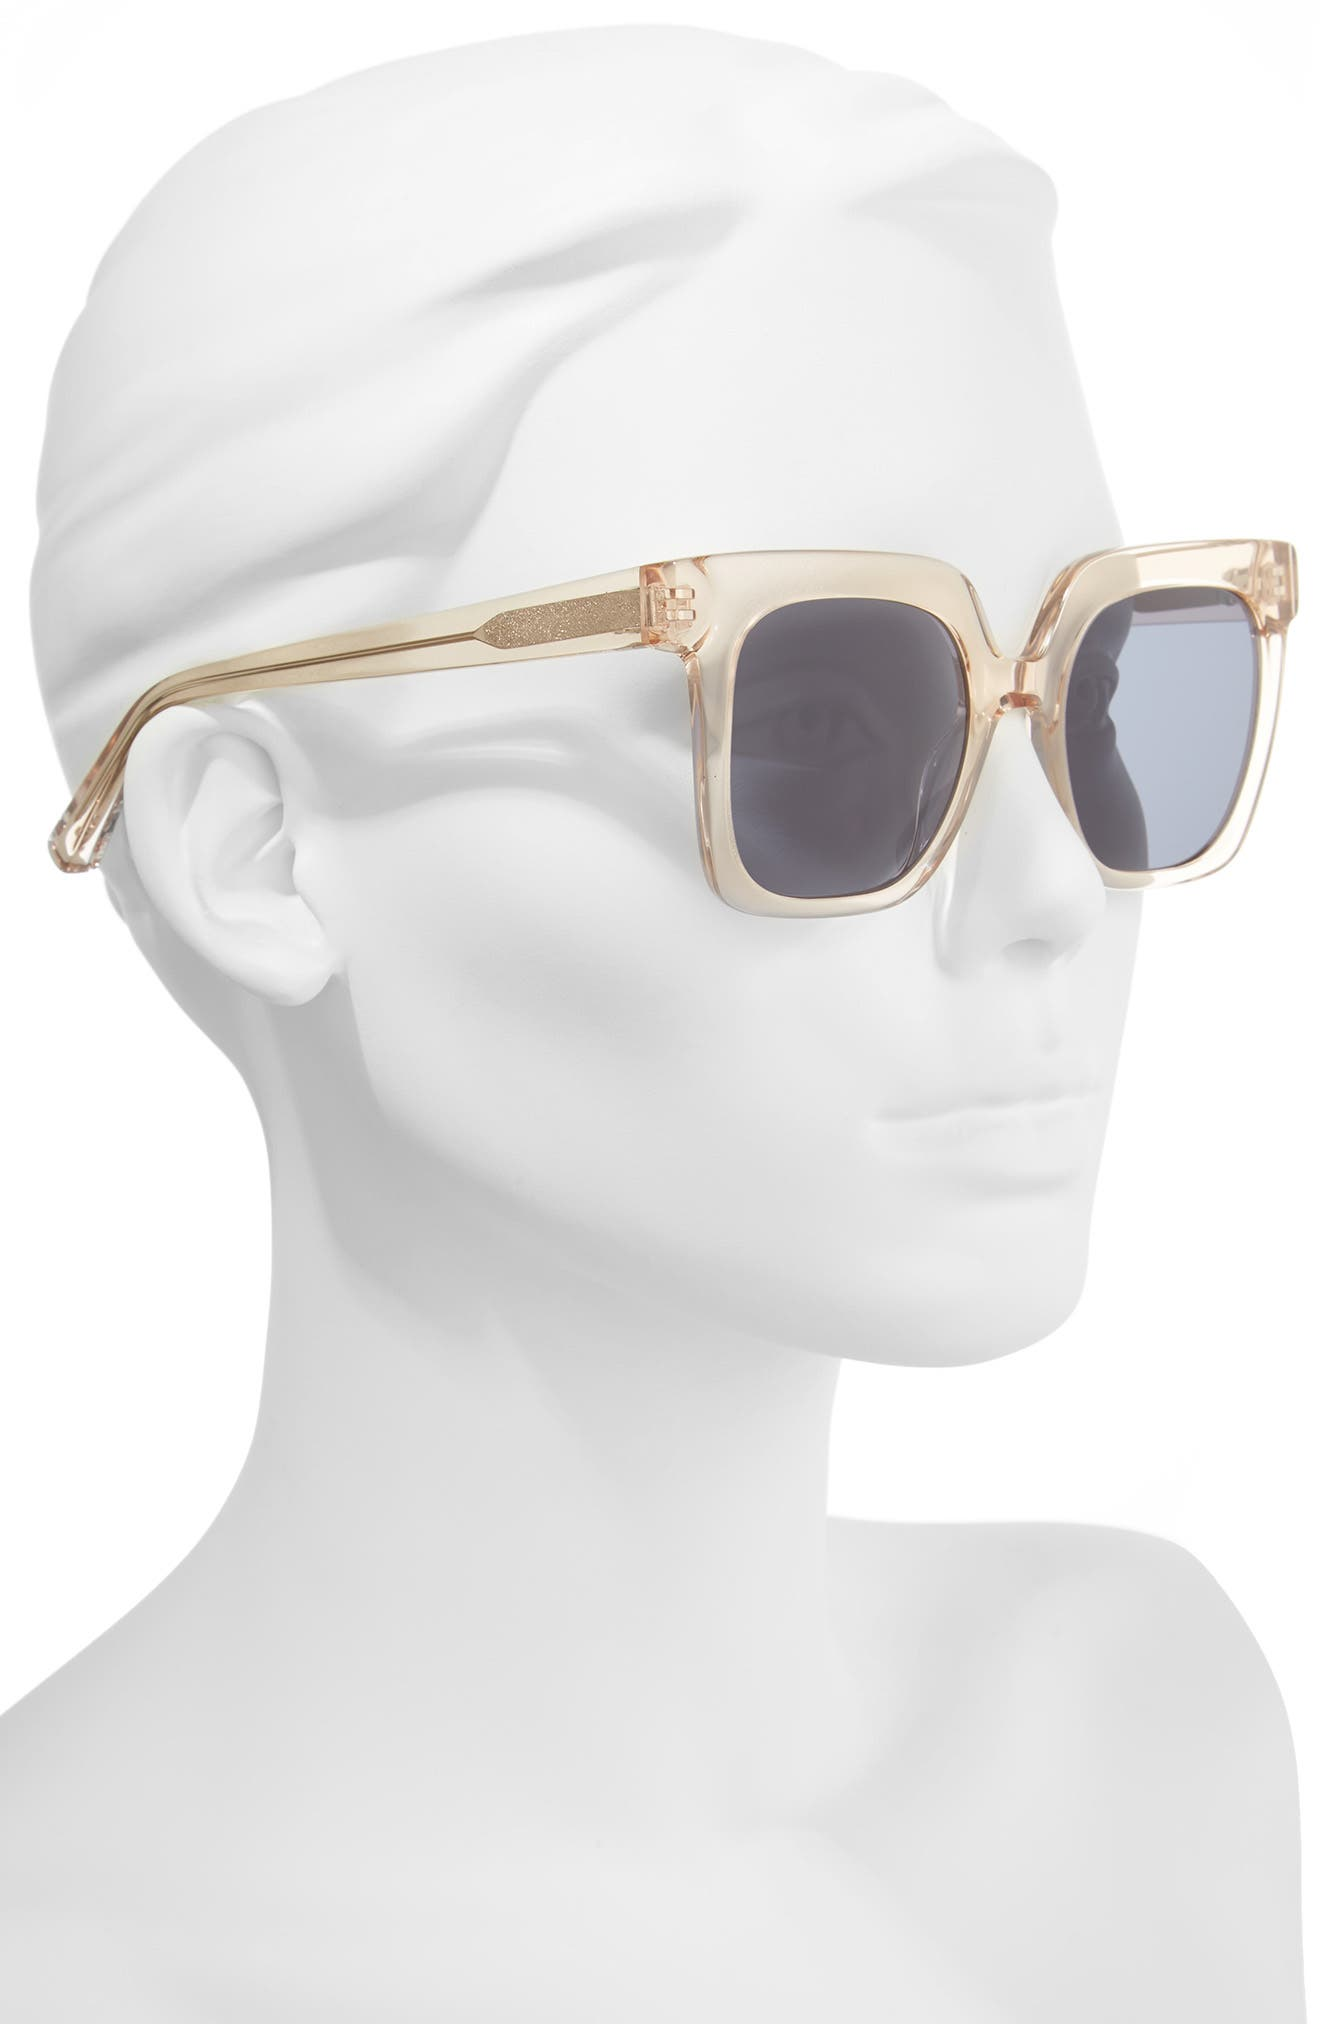 Rae 51mm Square Sunglasses,                             Alternate thumbnail 2, color,                             Crystal Tea